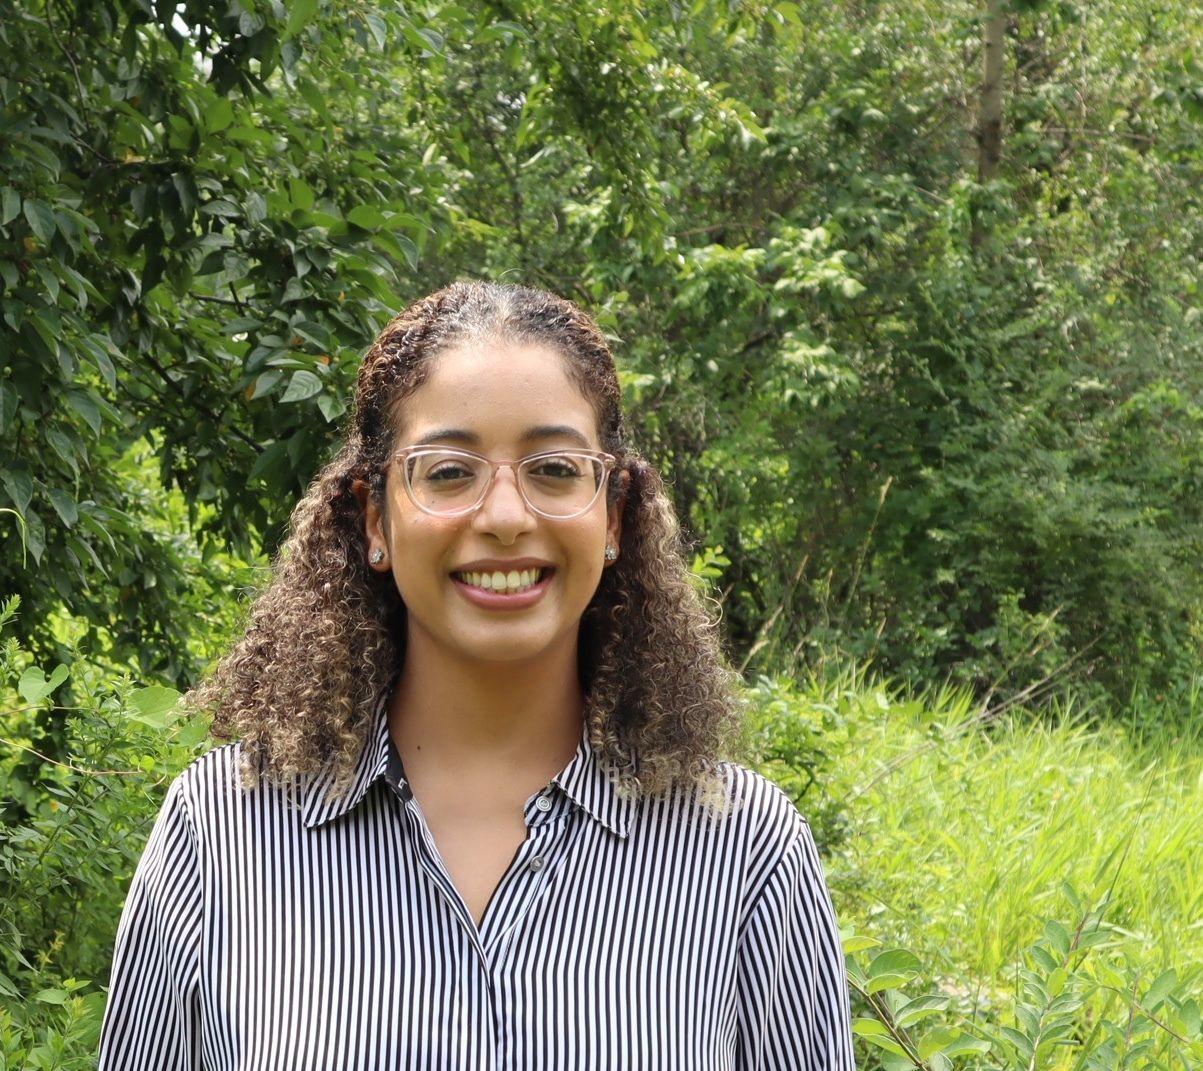 Priscilla De La Cruz, Audubon Senior Director of Government Affairs